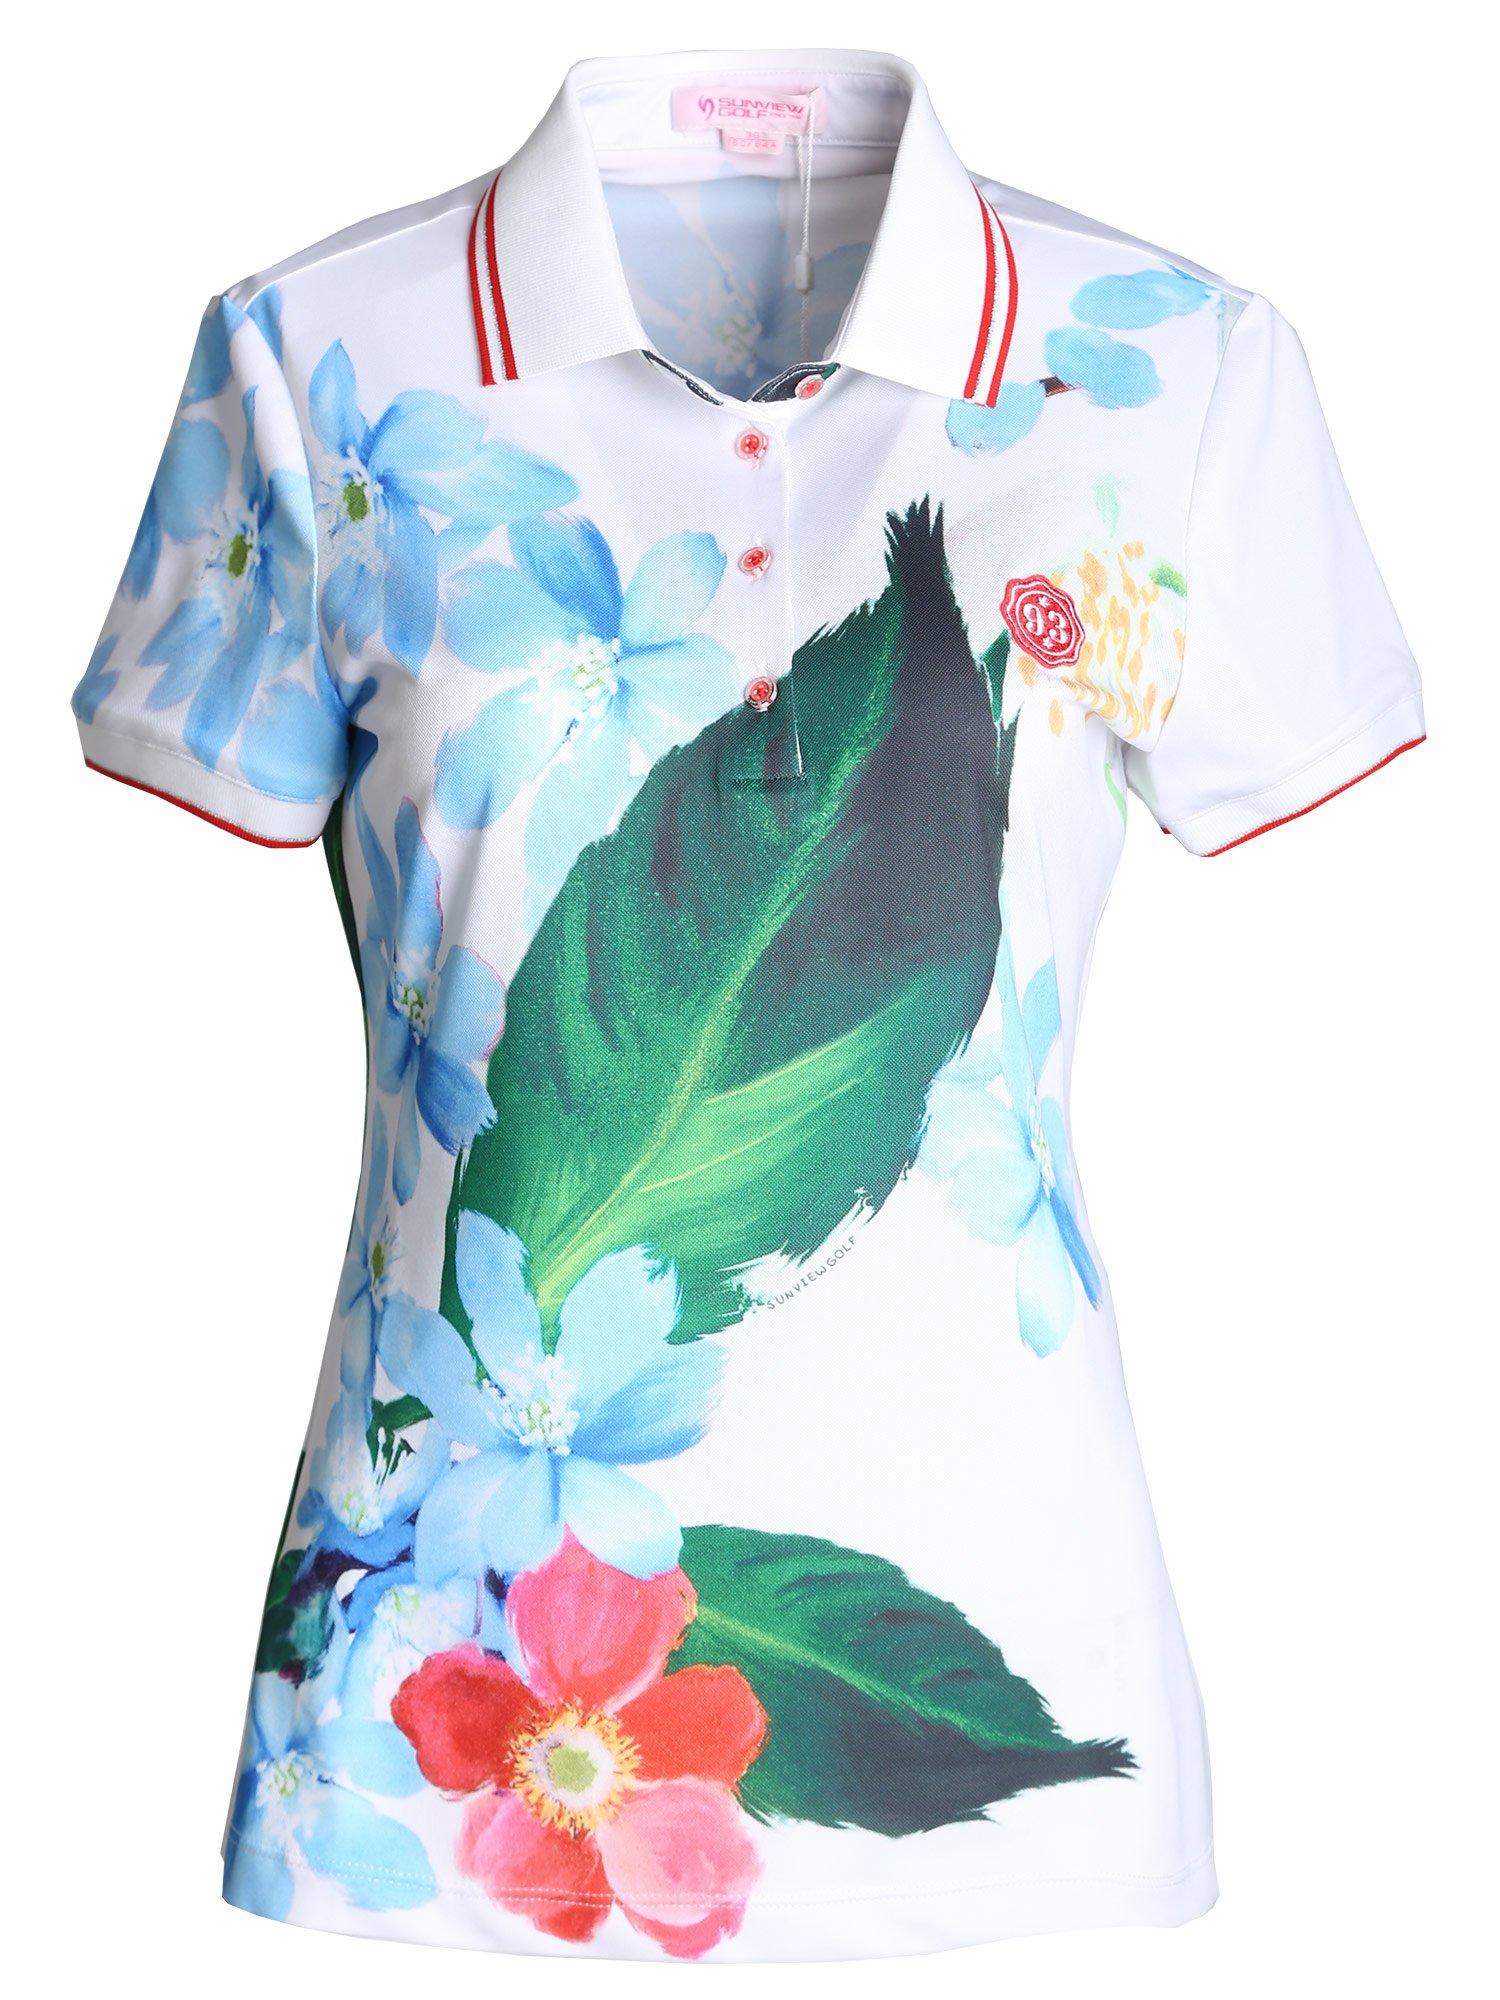 SunviewGolf Women's Elegant Floral Print Golf Shirt Summer Short Sleeve Polo Shirt Blue S